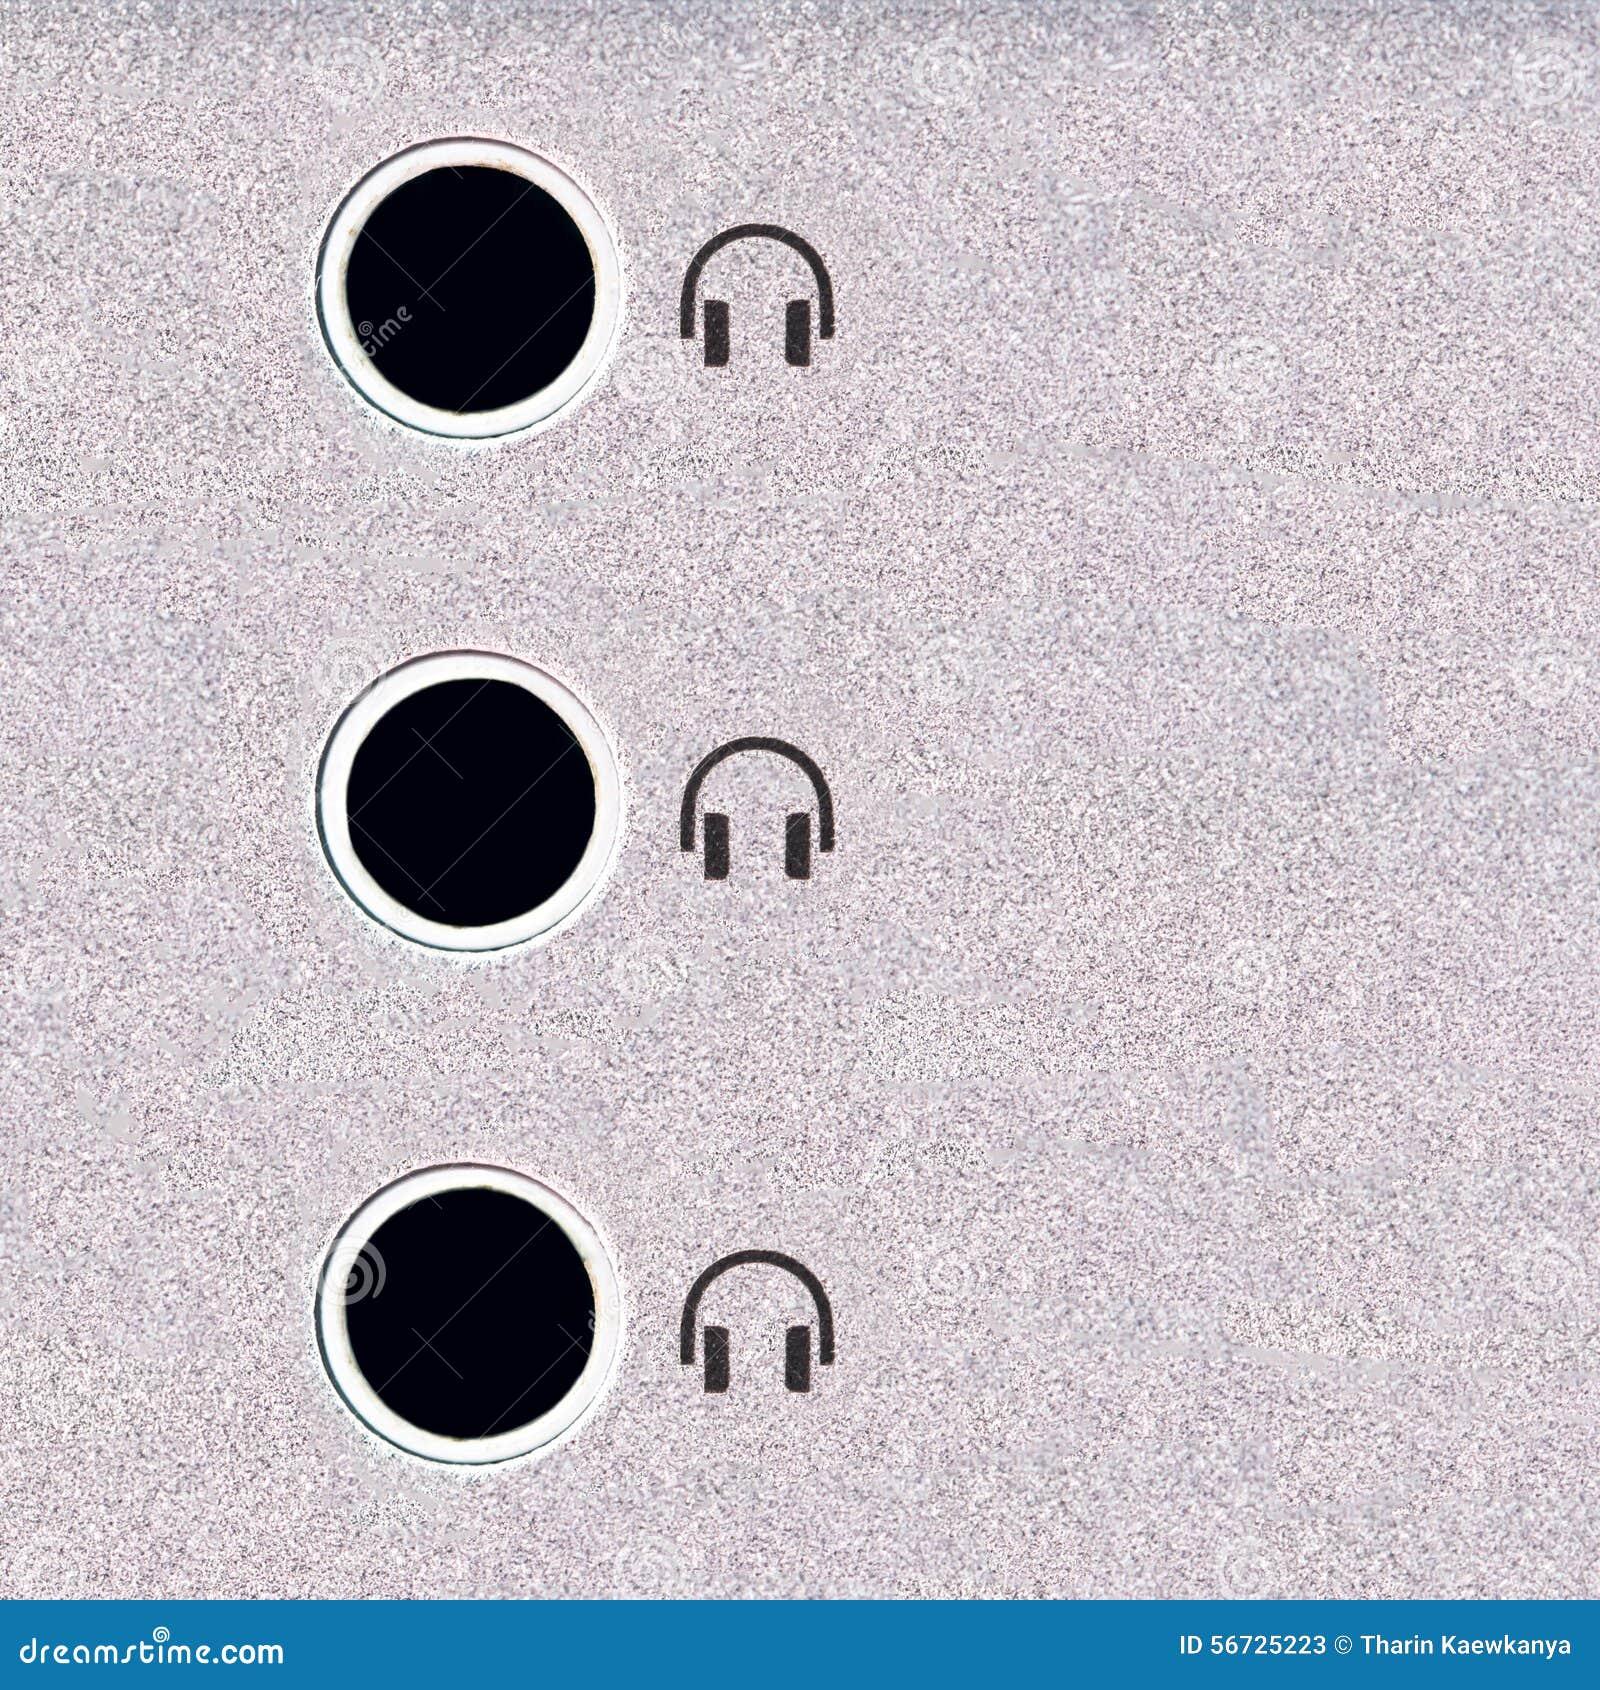 jack audio stock image  image of sound  computer  macro